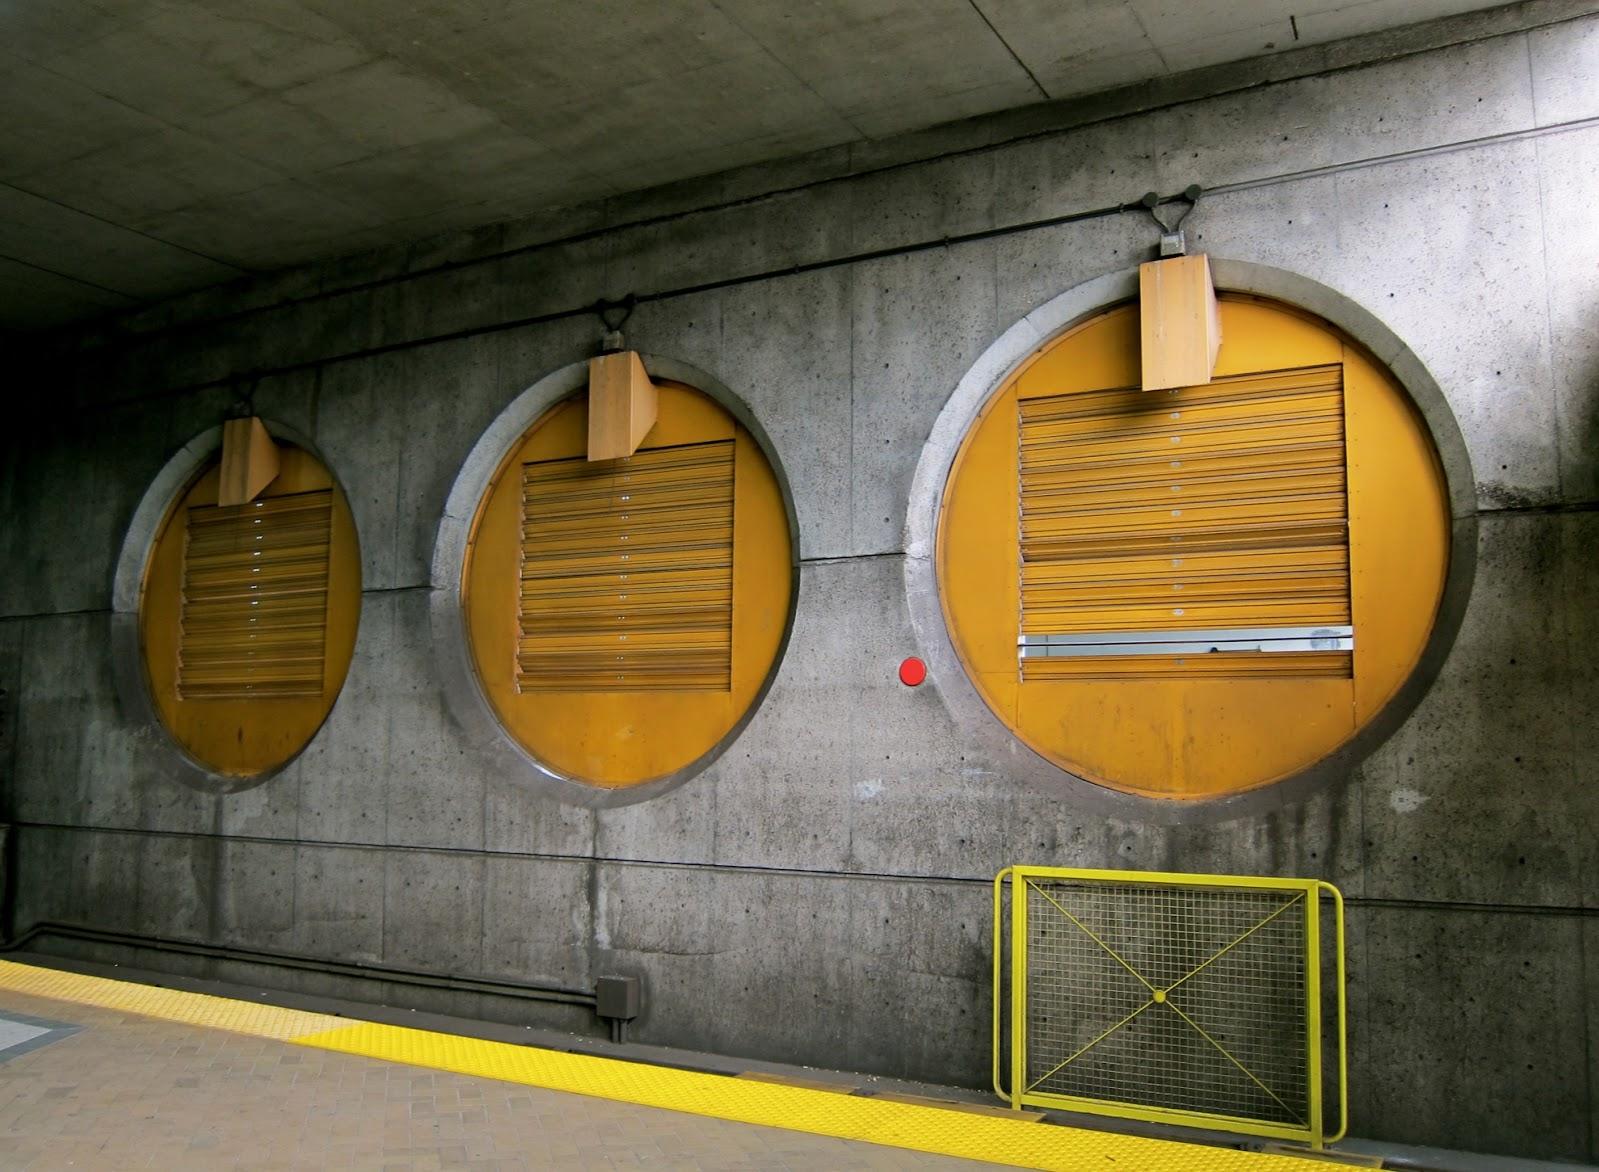 Circles at the north end of the subway platform at Lawrence West